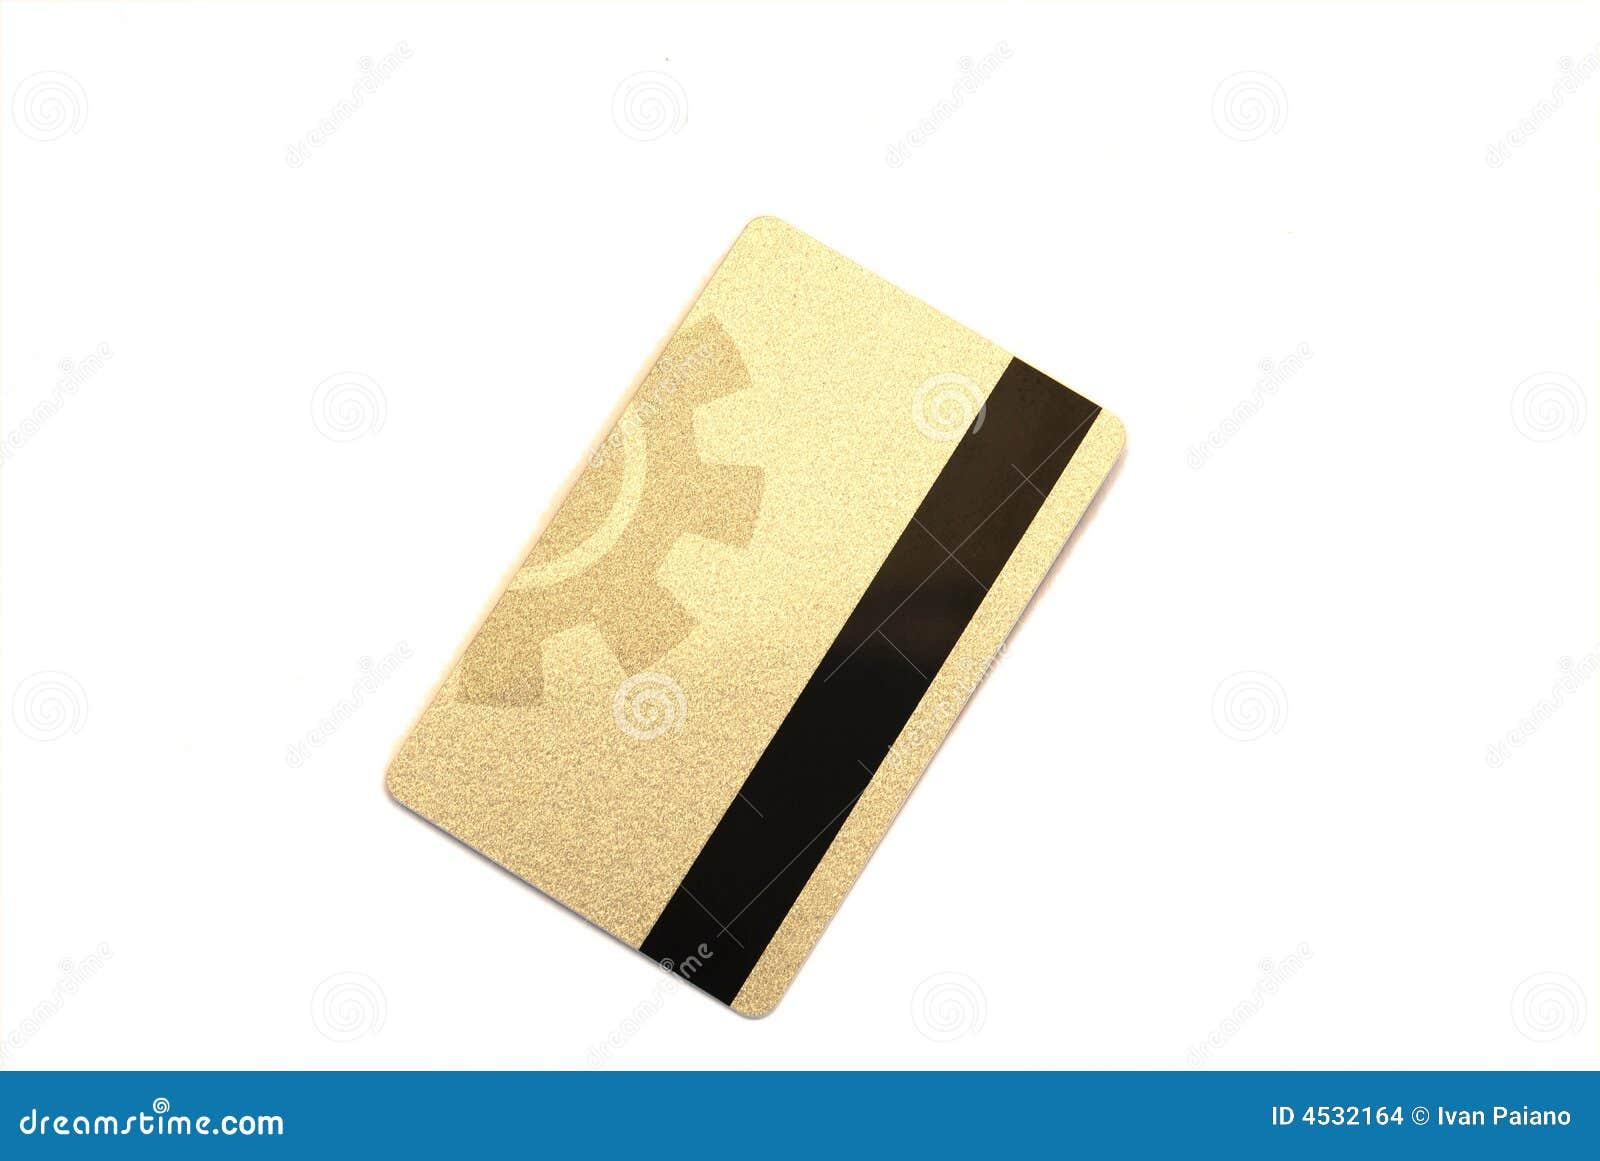 Una scheda magnetica